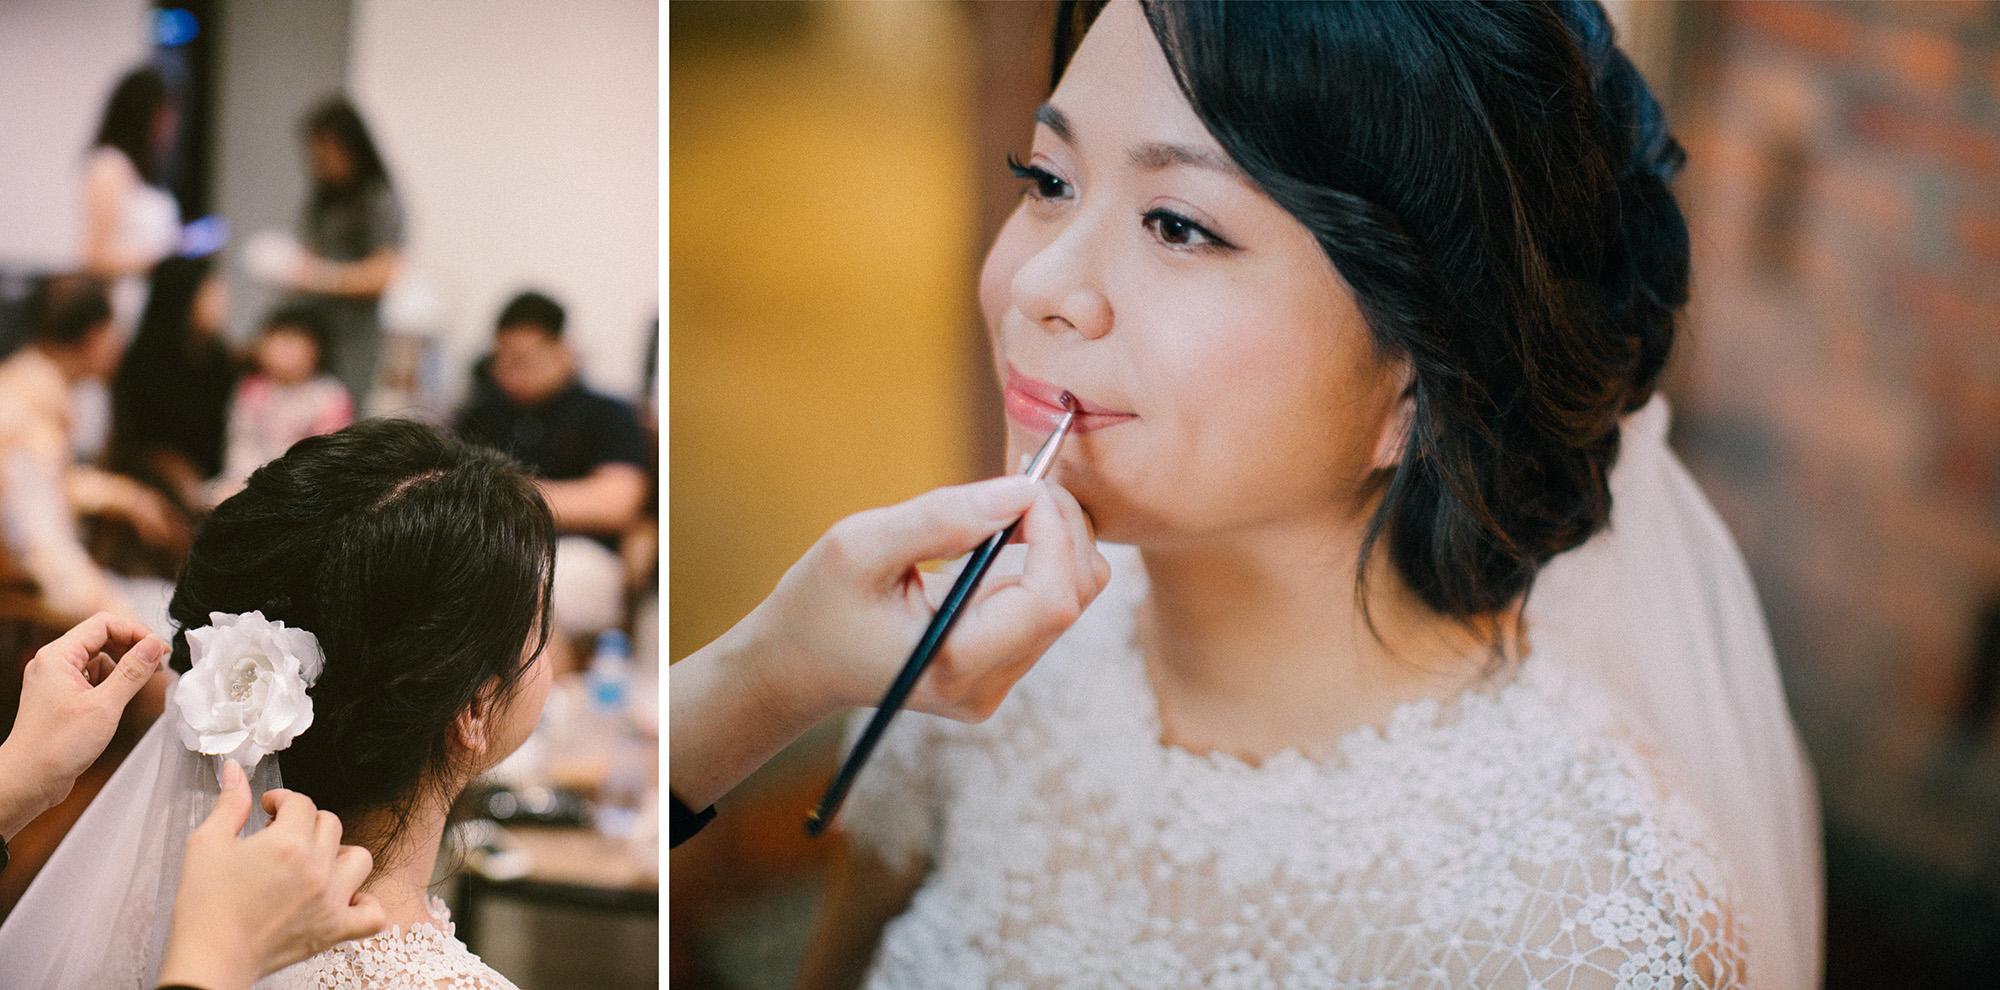 4-hellojanelee-sam grace-malaysia-wedding-day